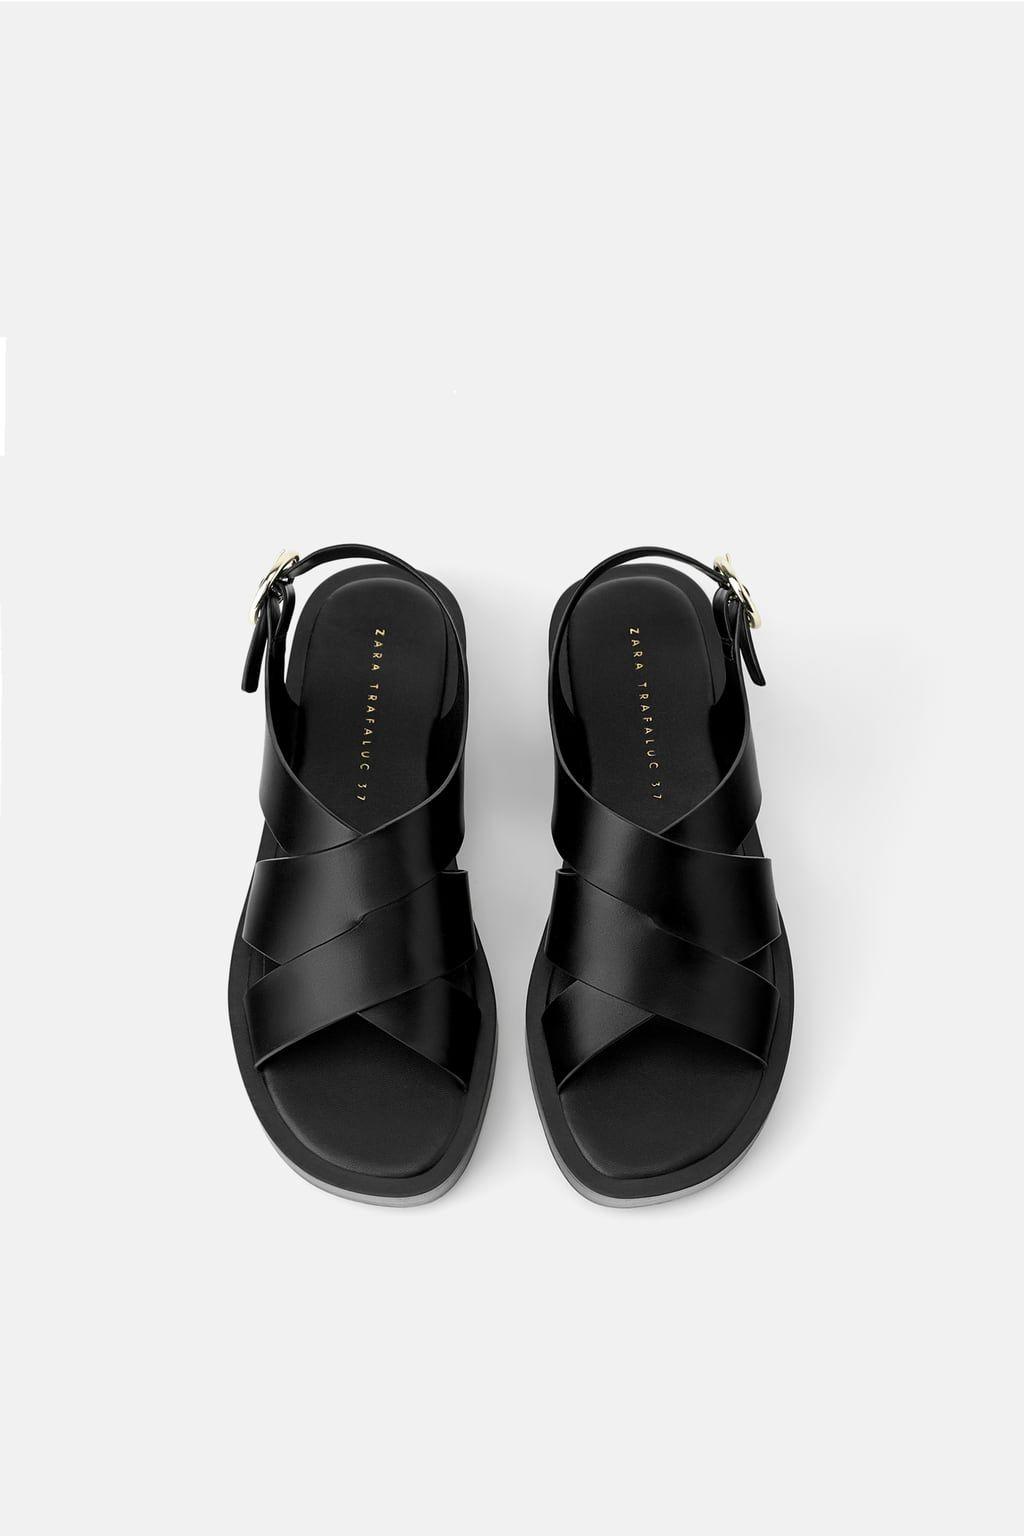 0bdd1a0c8 Join life minimal flat sandals in 2019 | I <3 want | Sandals, Flat ...